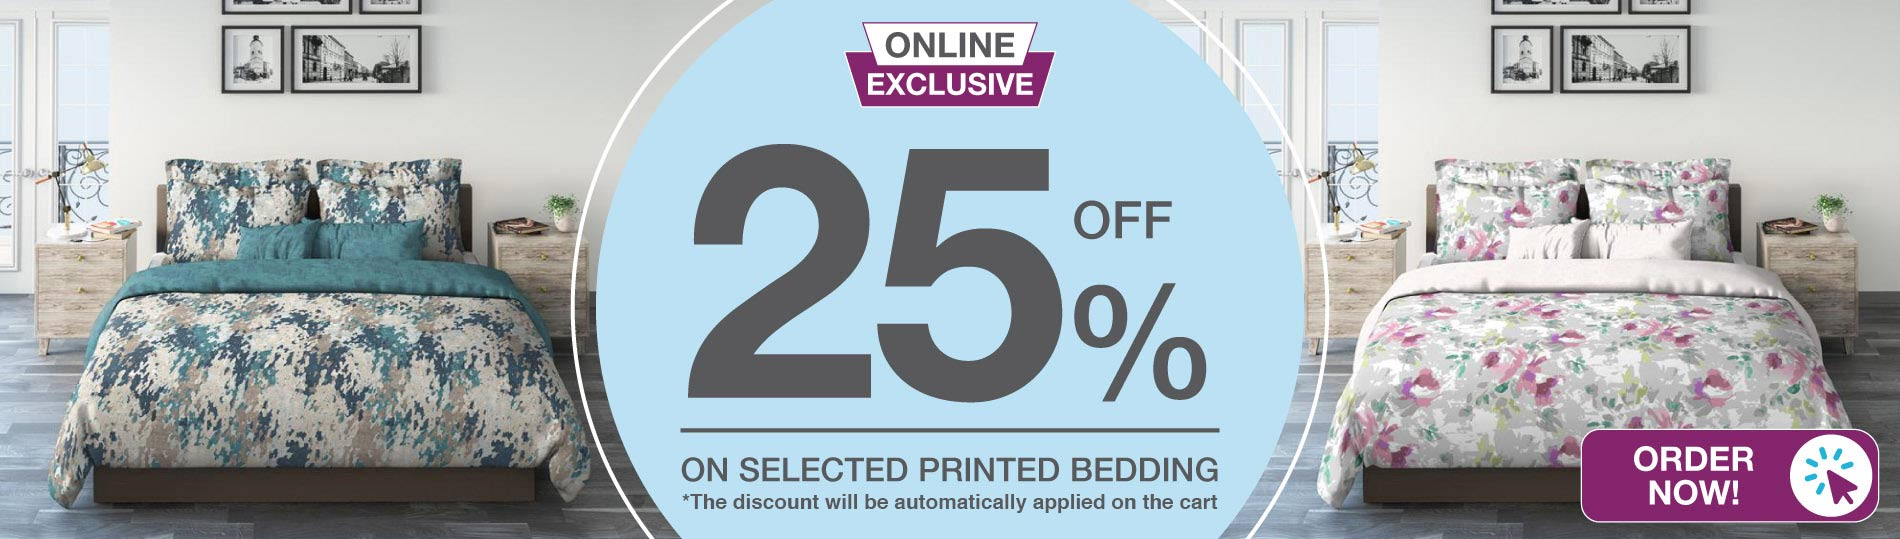 online exclusive printed bedding